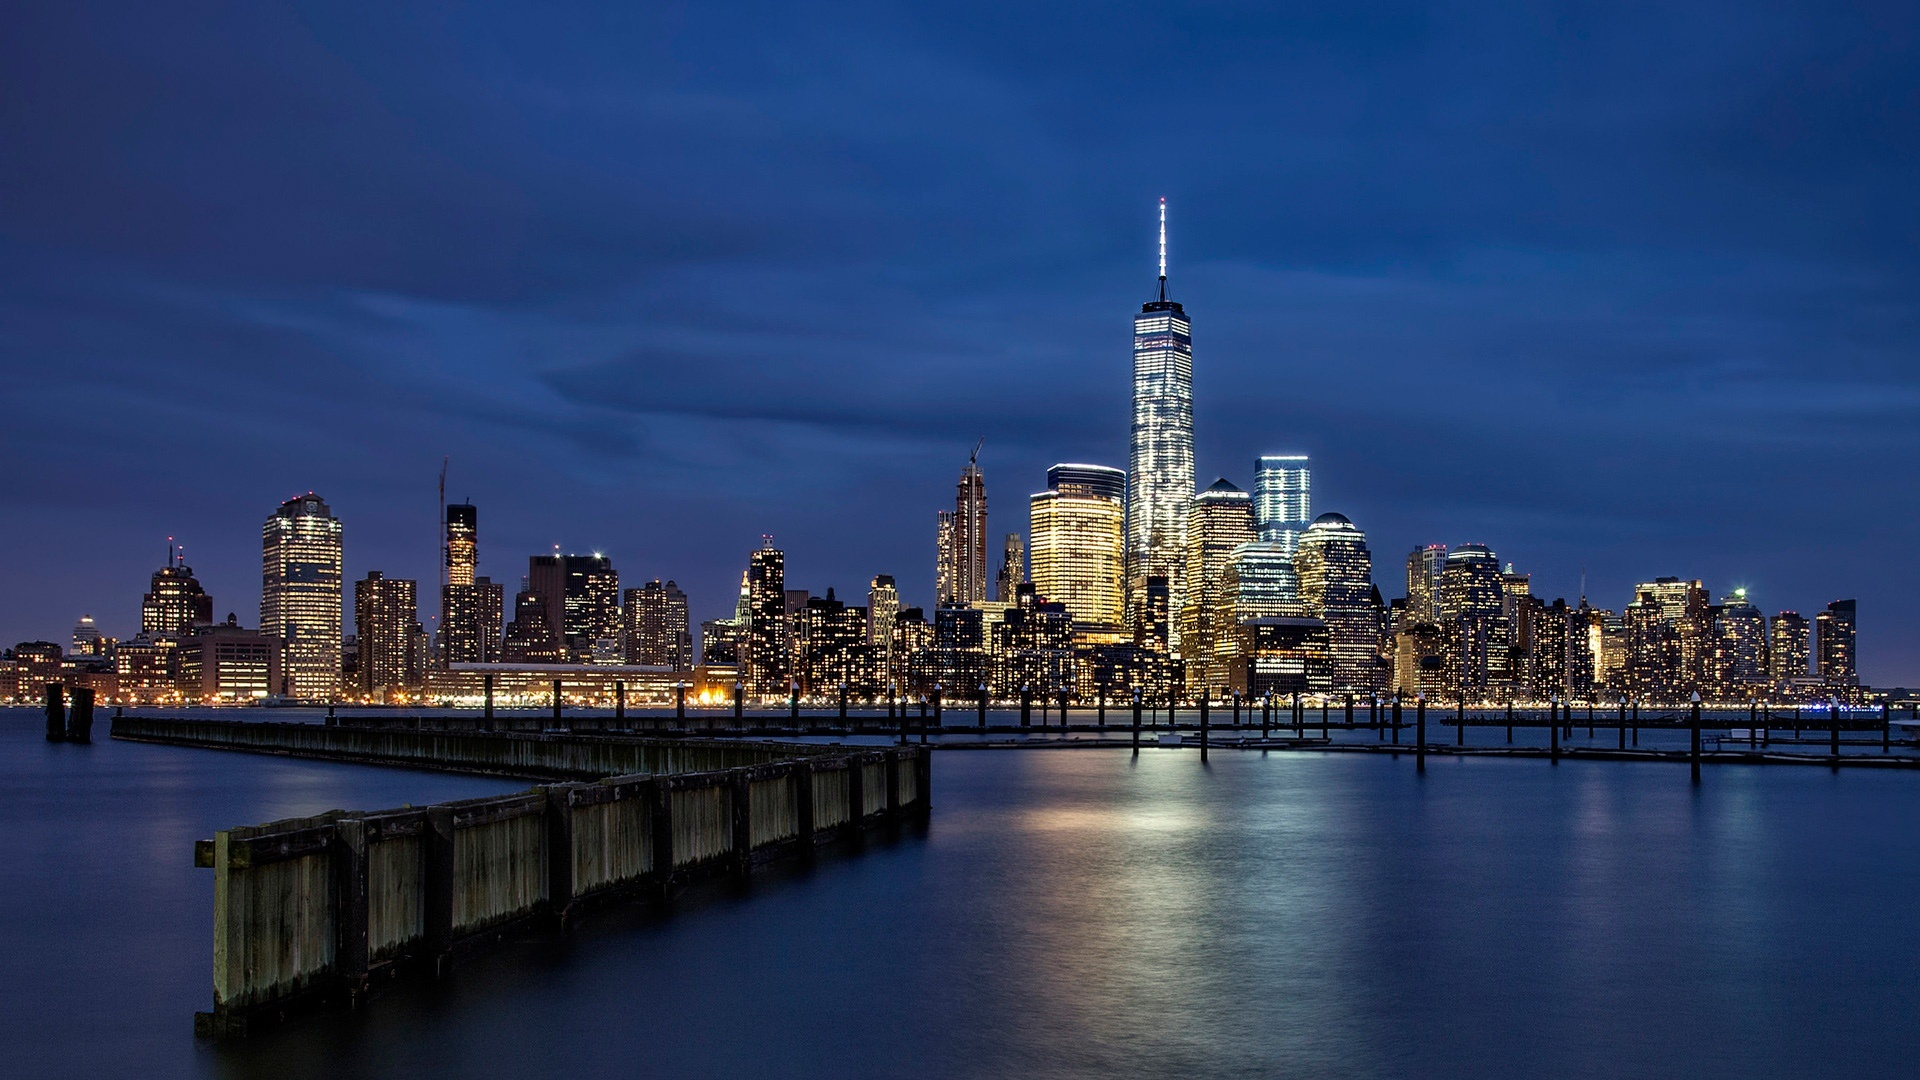 Lower Manhattan at night wallpaper